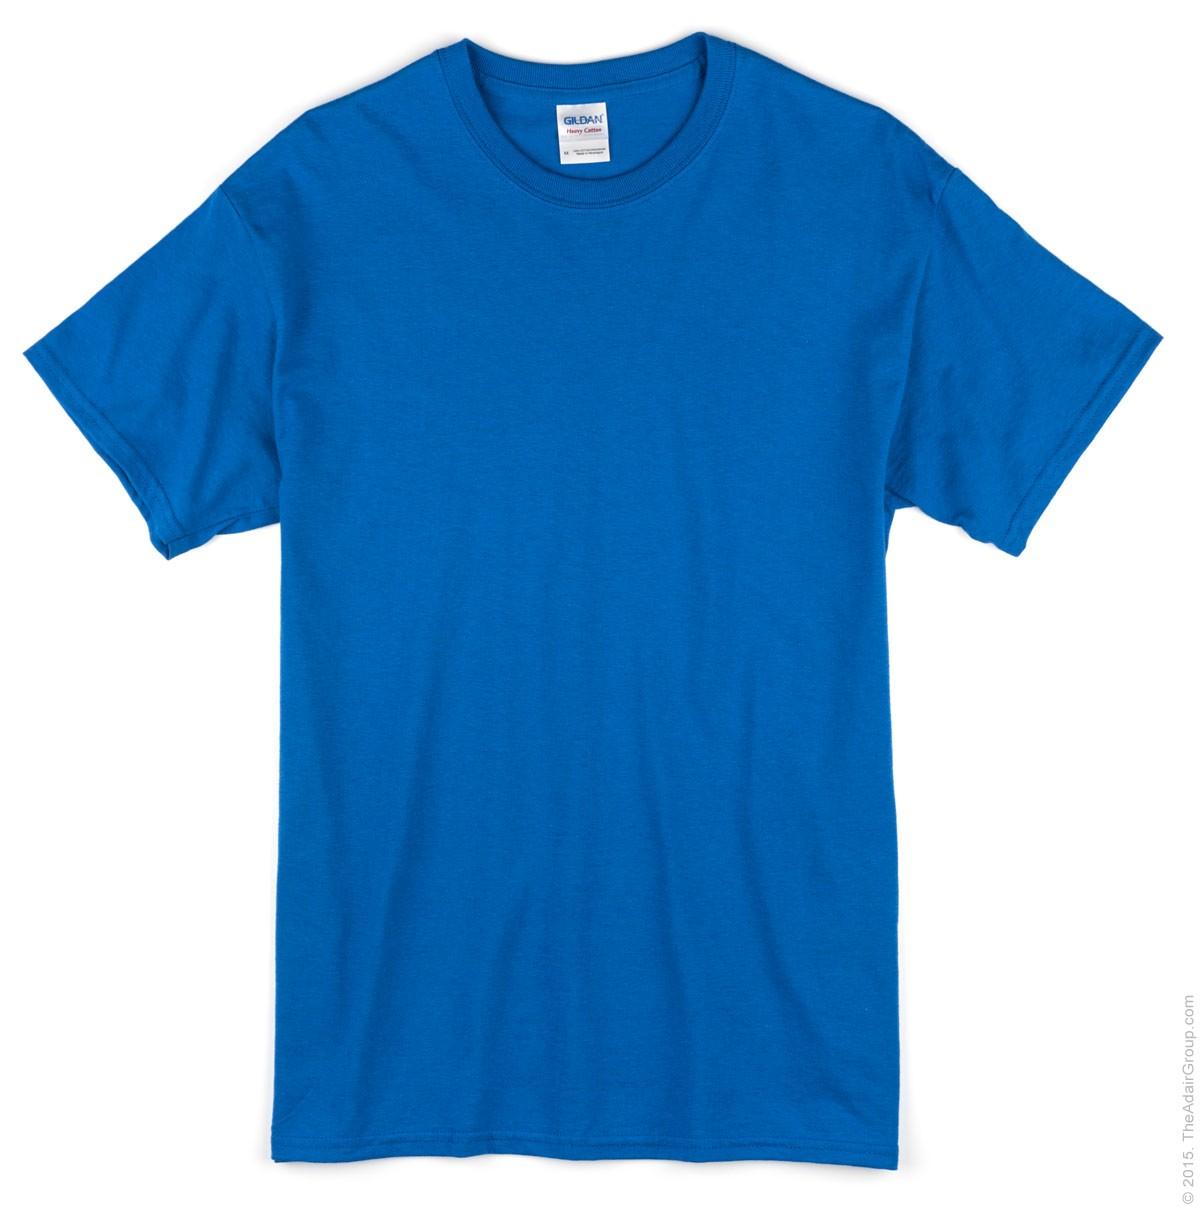 blank tshirt clipart best